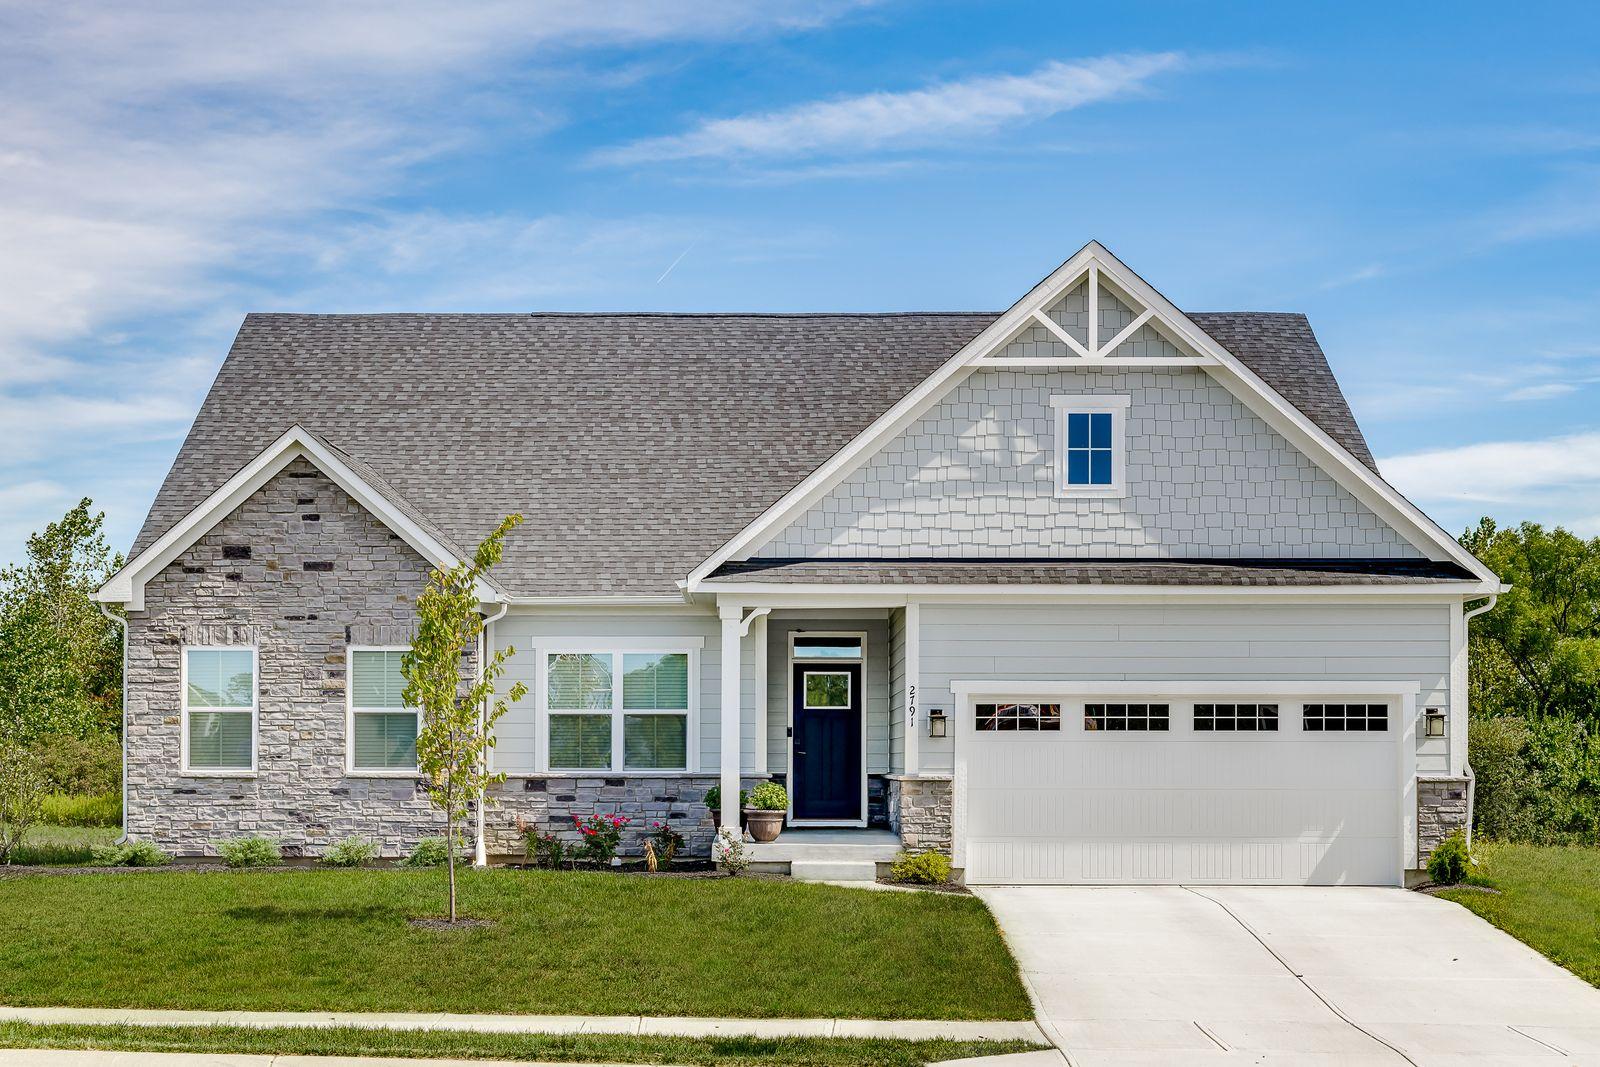 Holston Hills - Ranch Homes With Full Basements at 146th & Gray